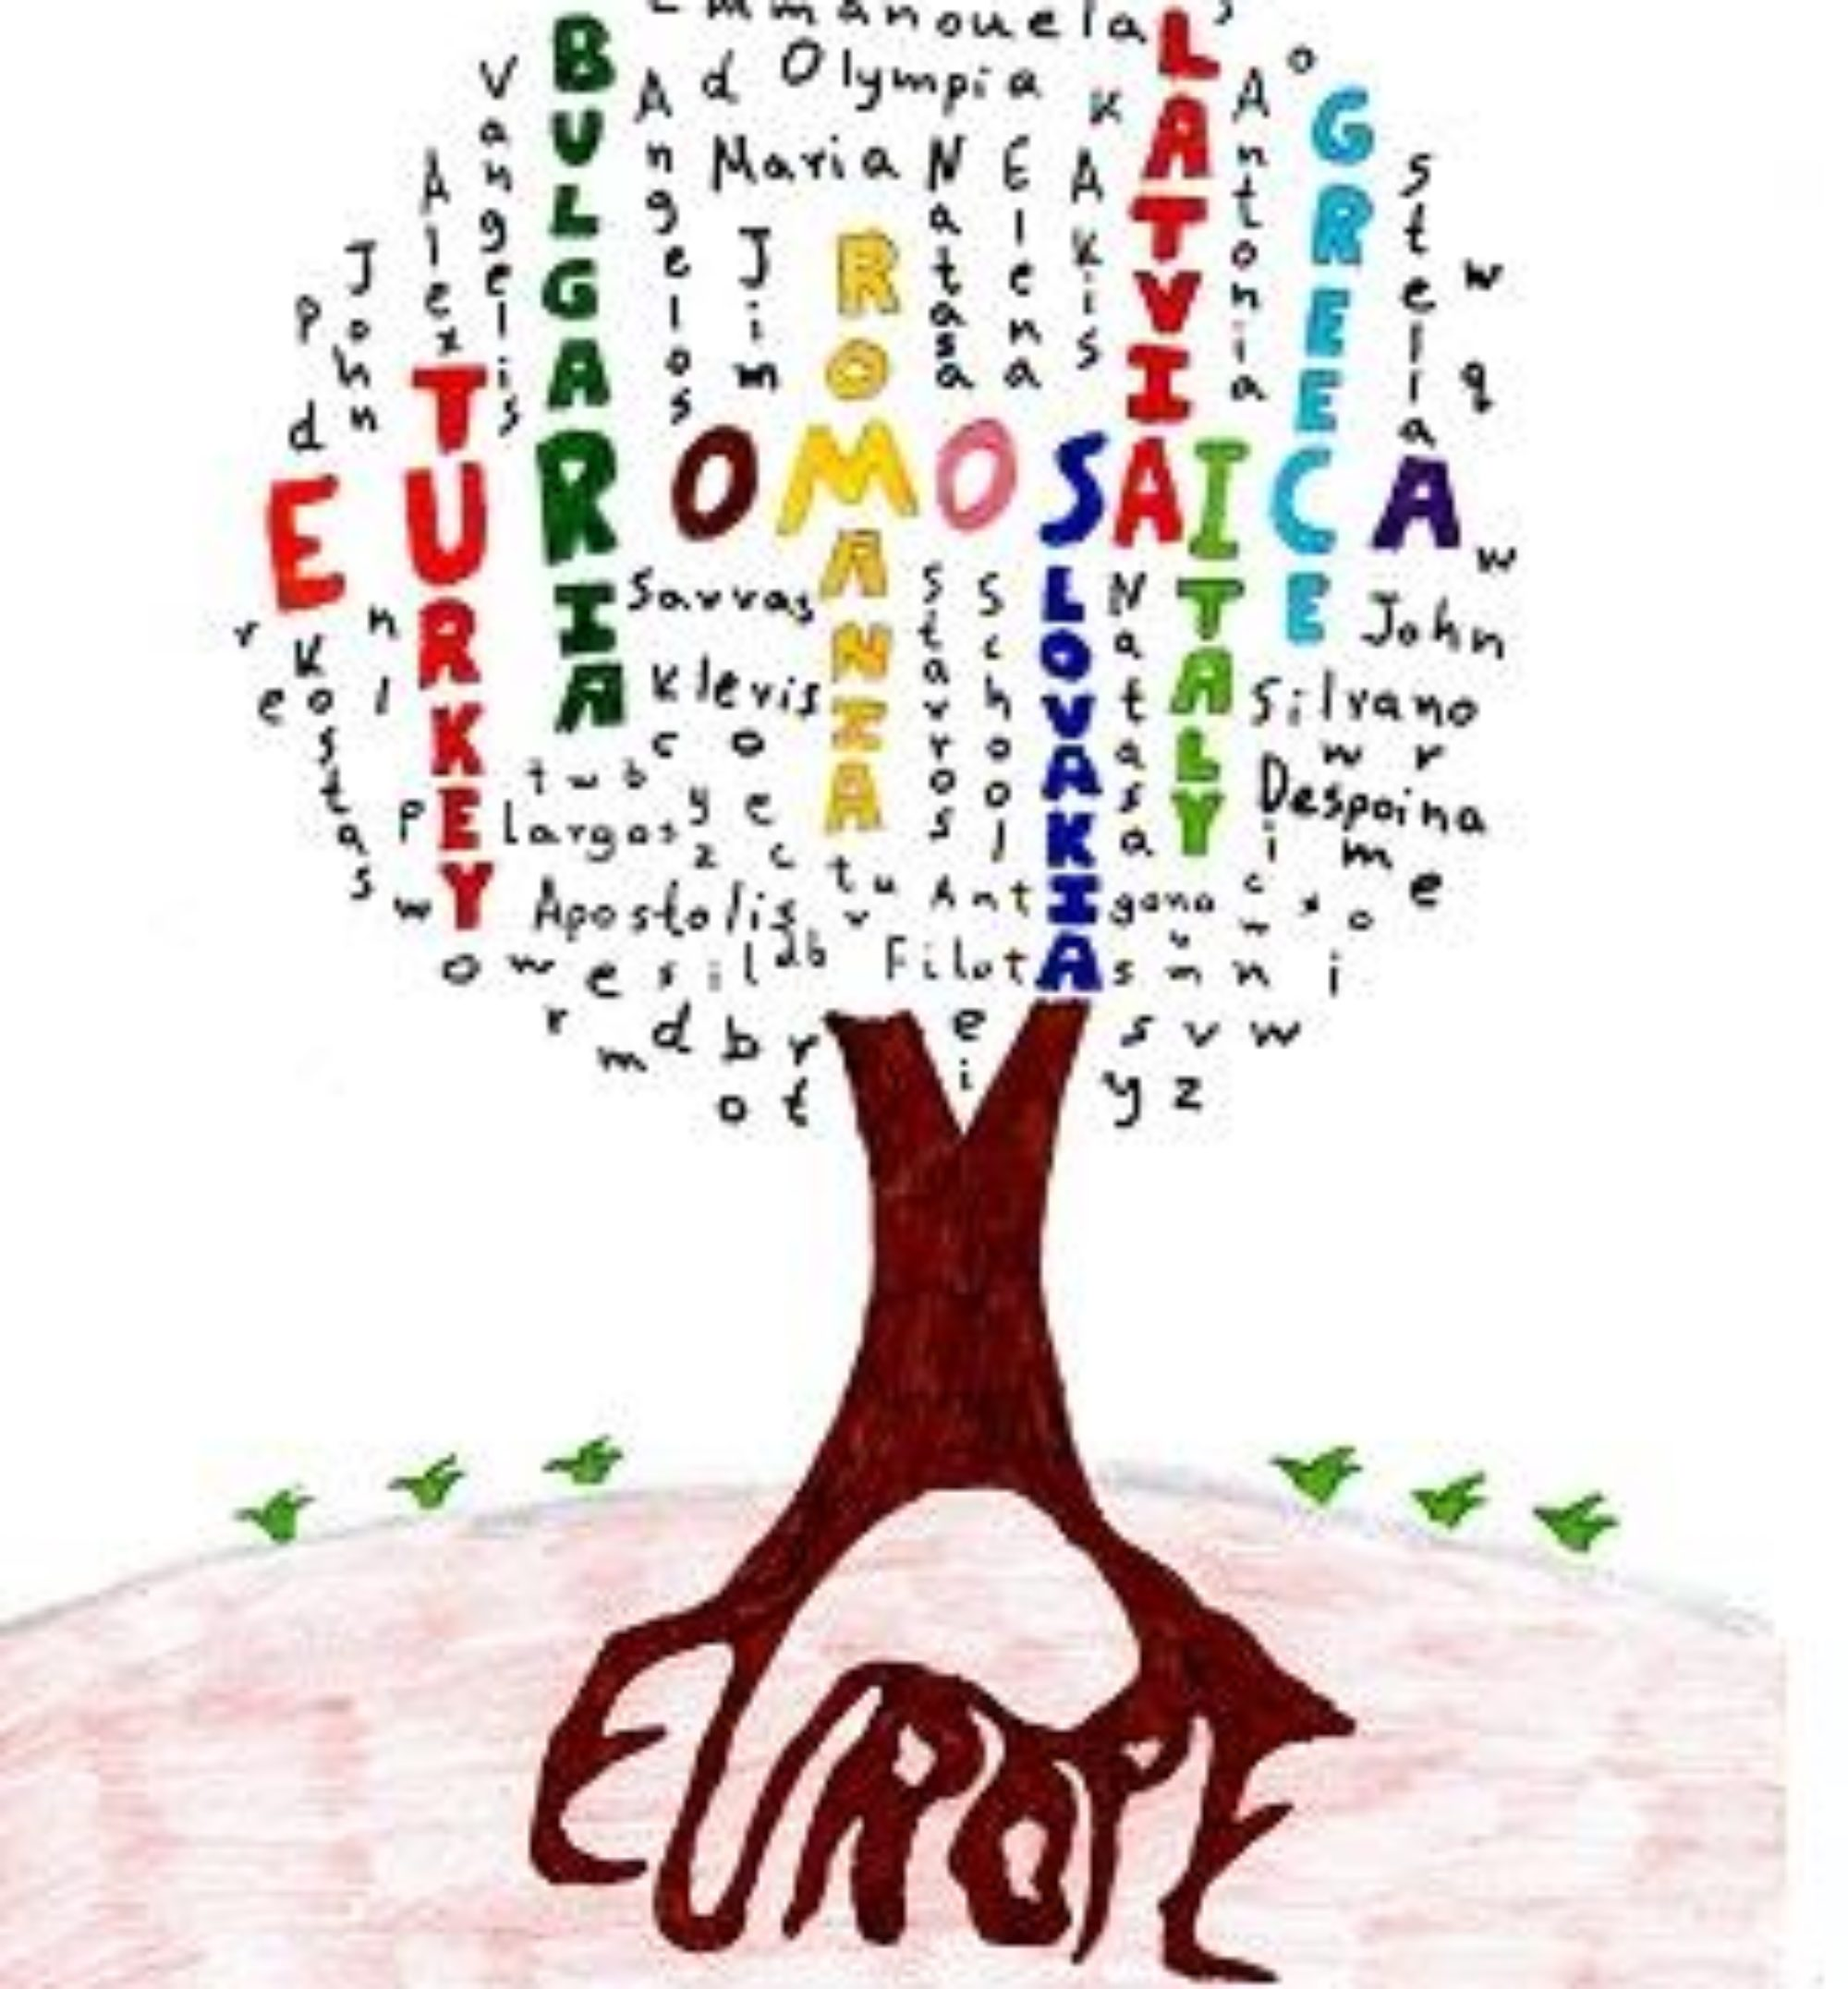 EUROMOSAICA